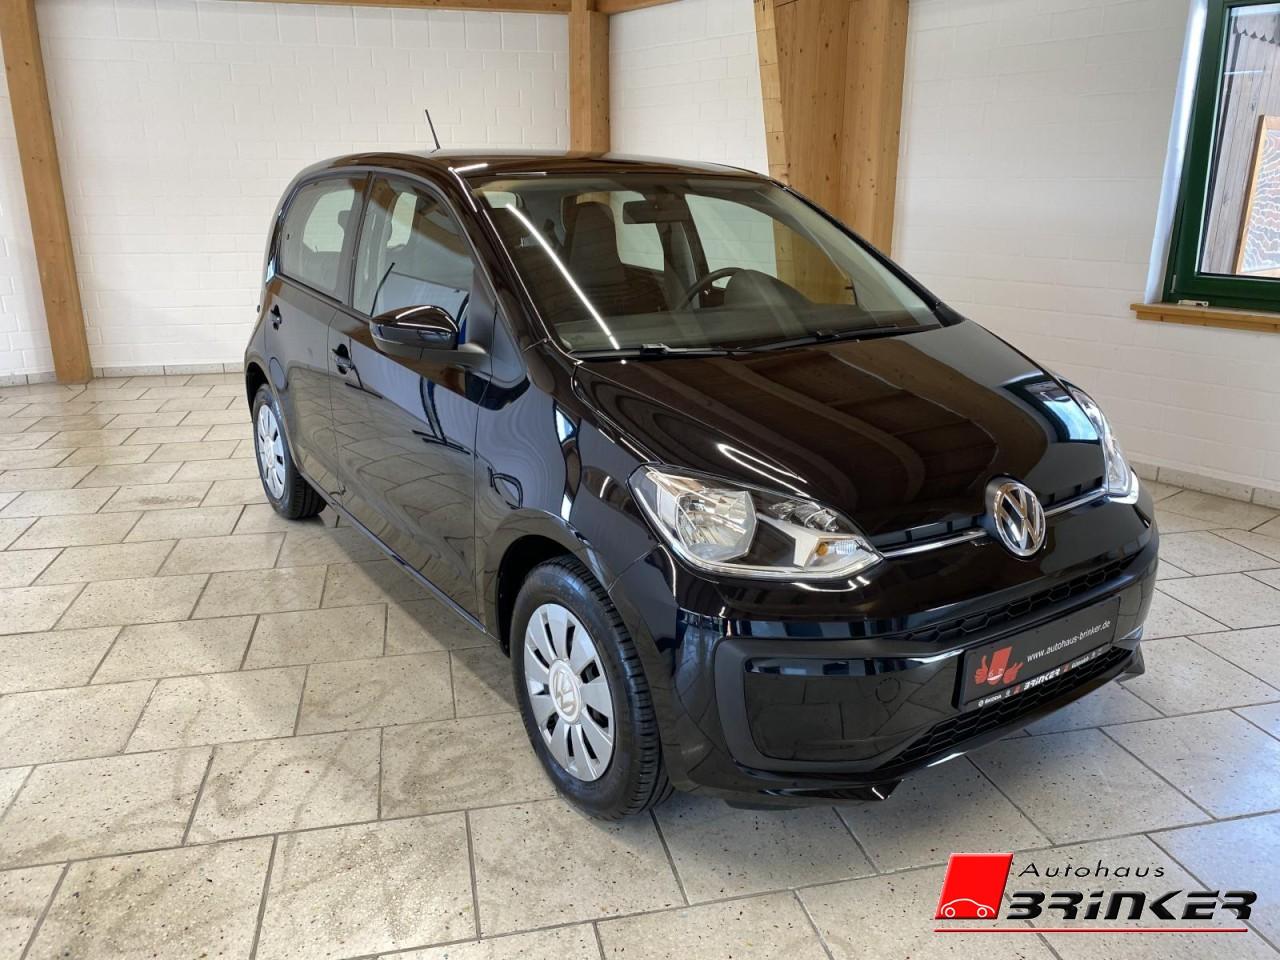 Volkswagen up! 1.0 BMT move up! ASG Klima Fenster el., Jahr 2018, Benzin